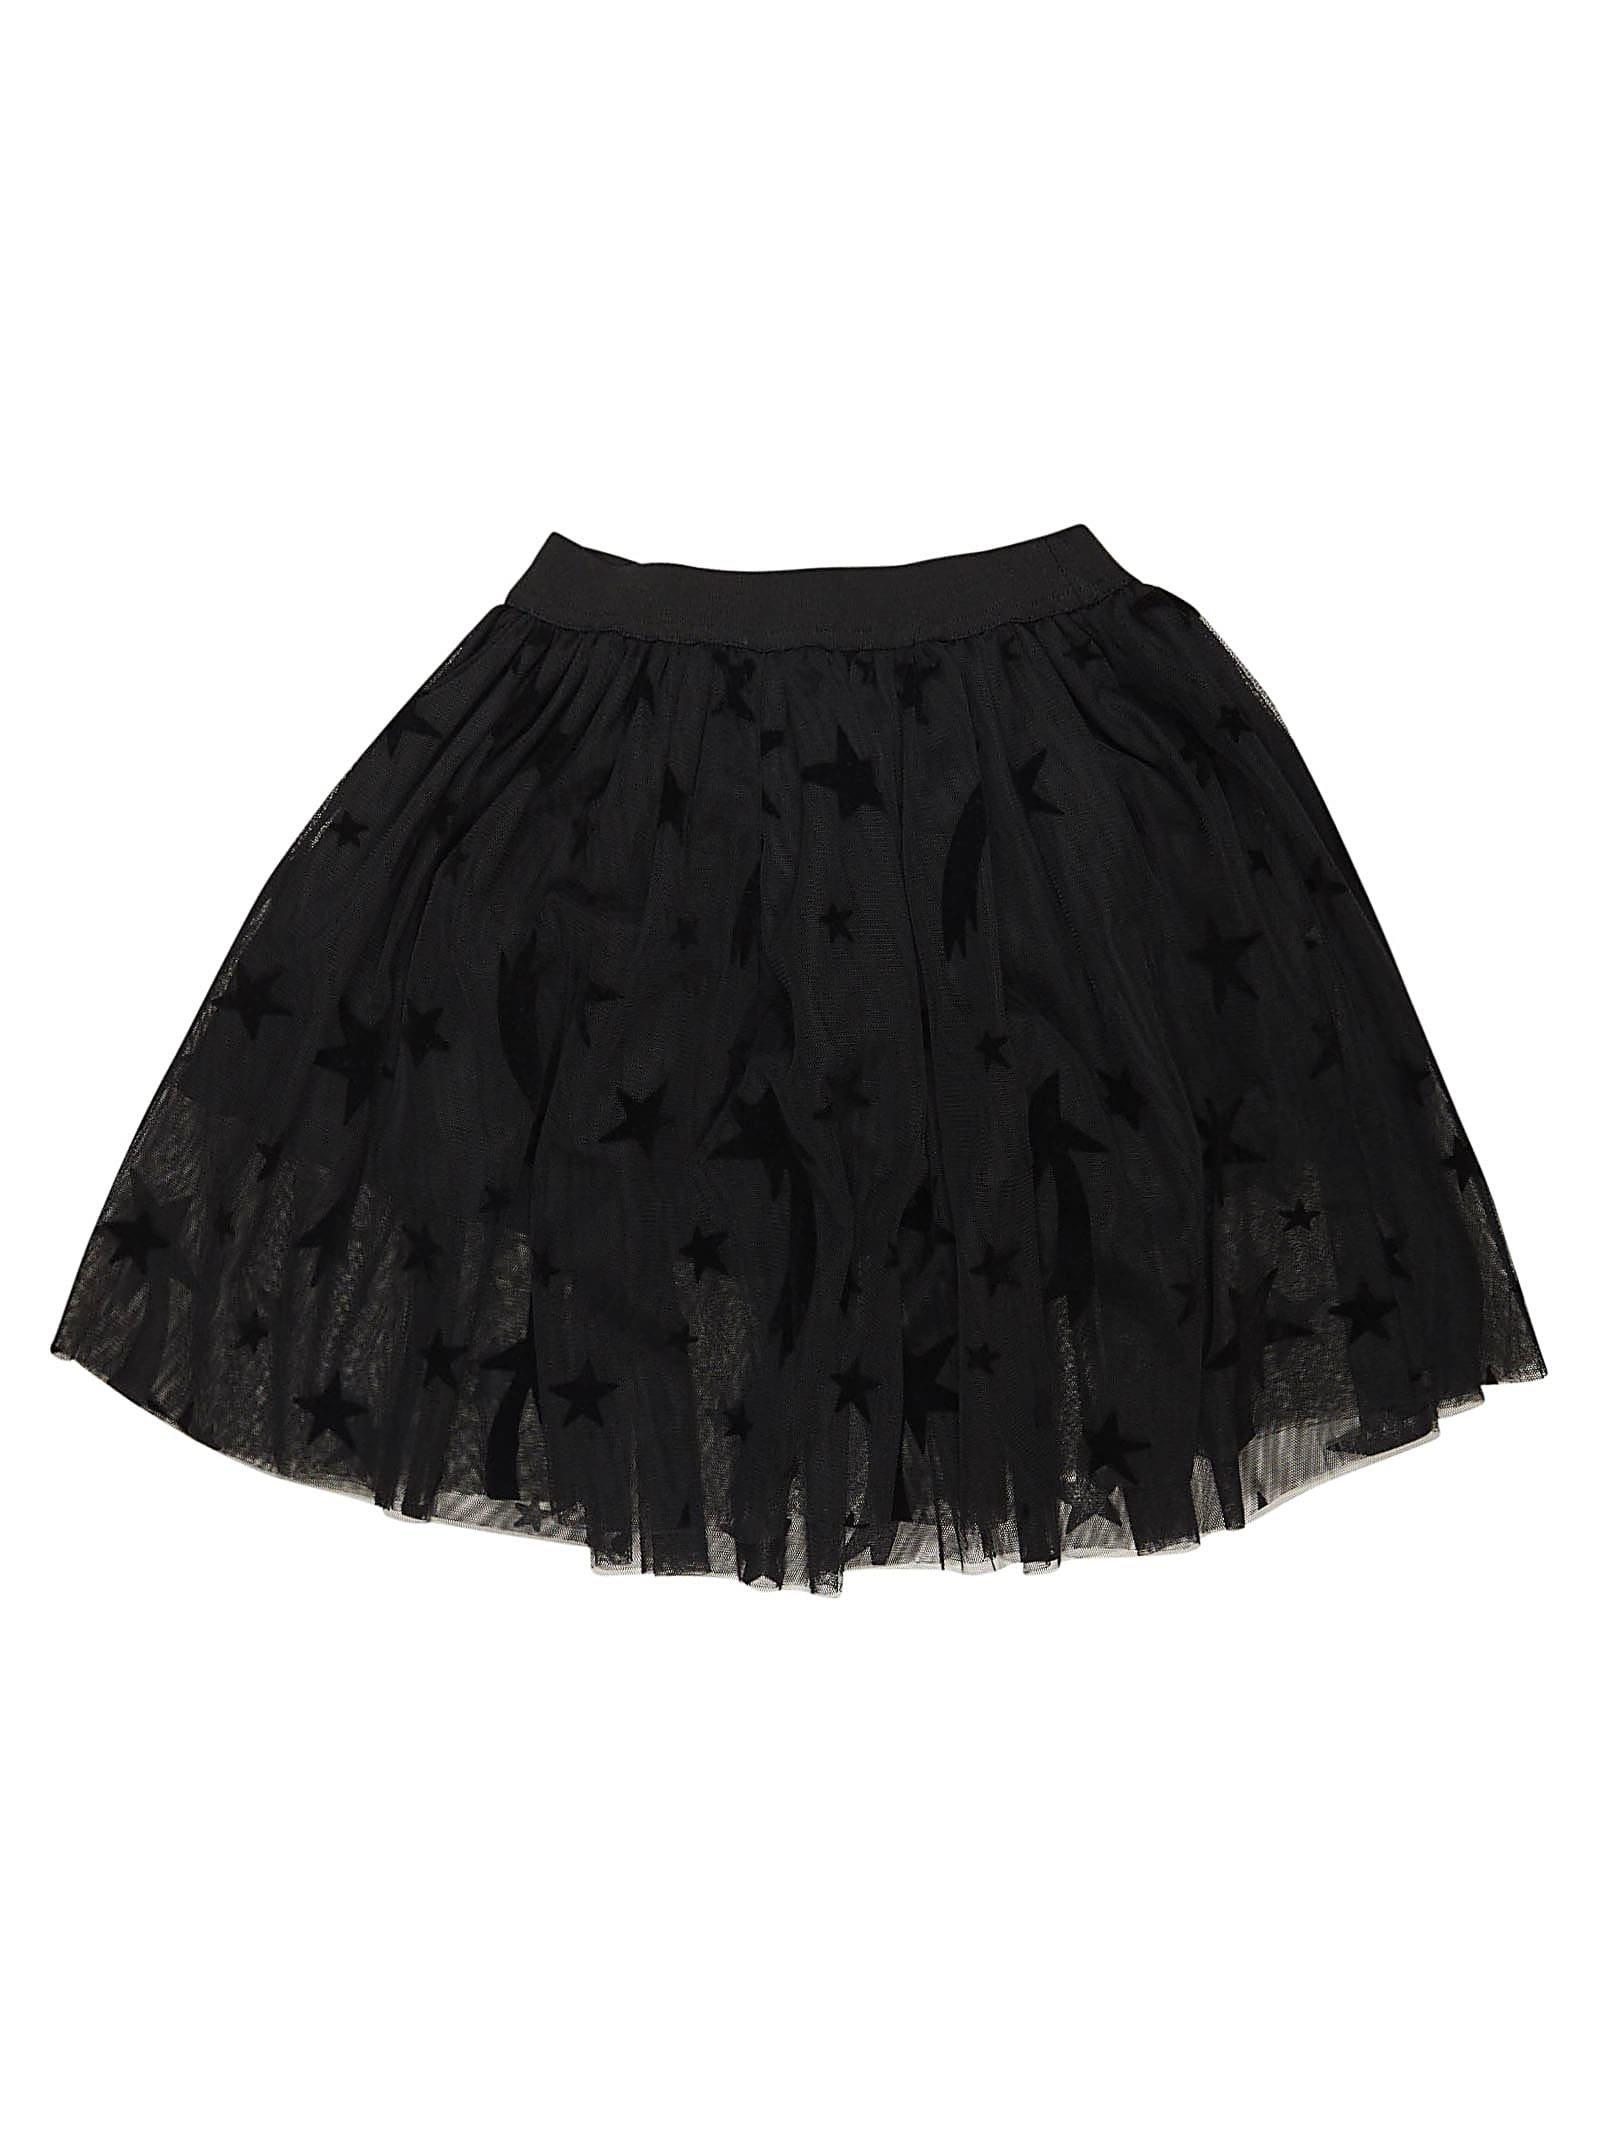 Stella McCartney Laced Skirt